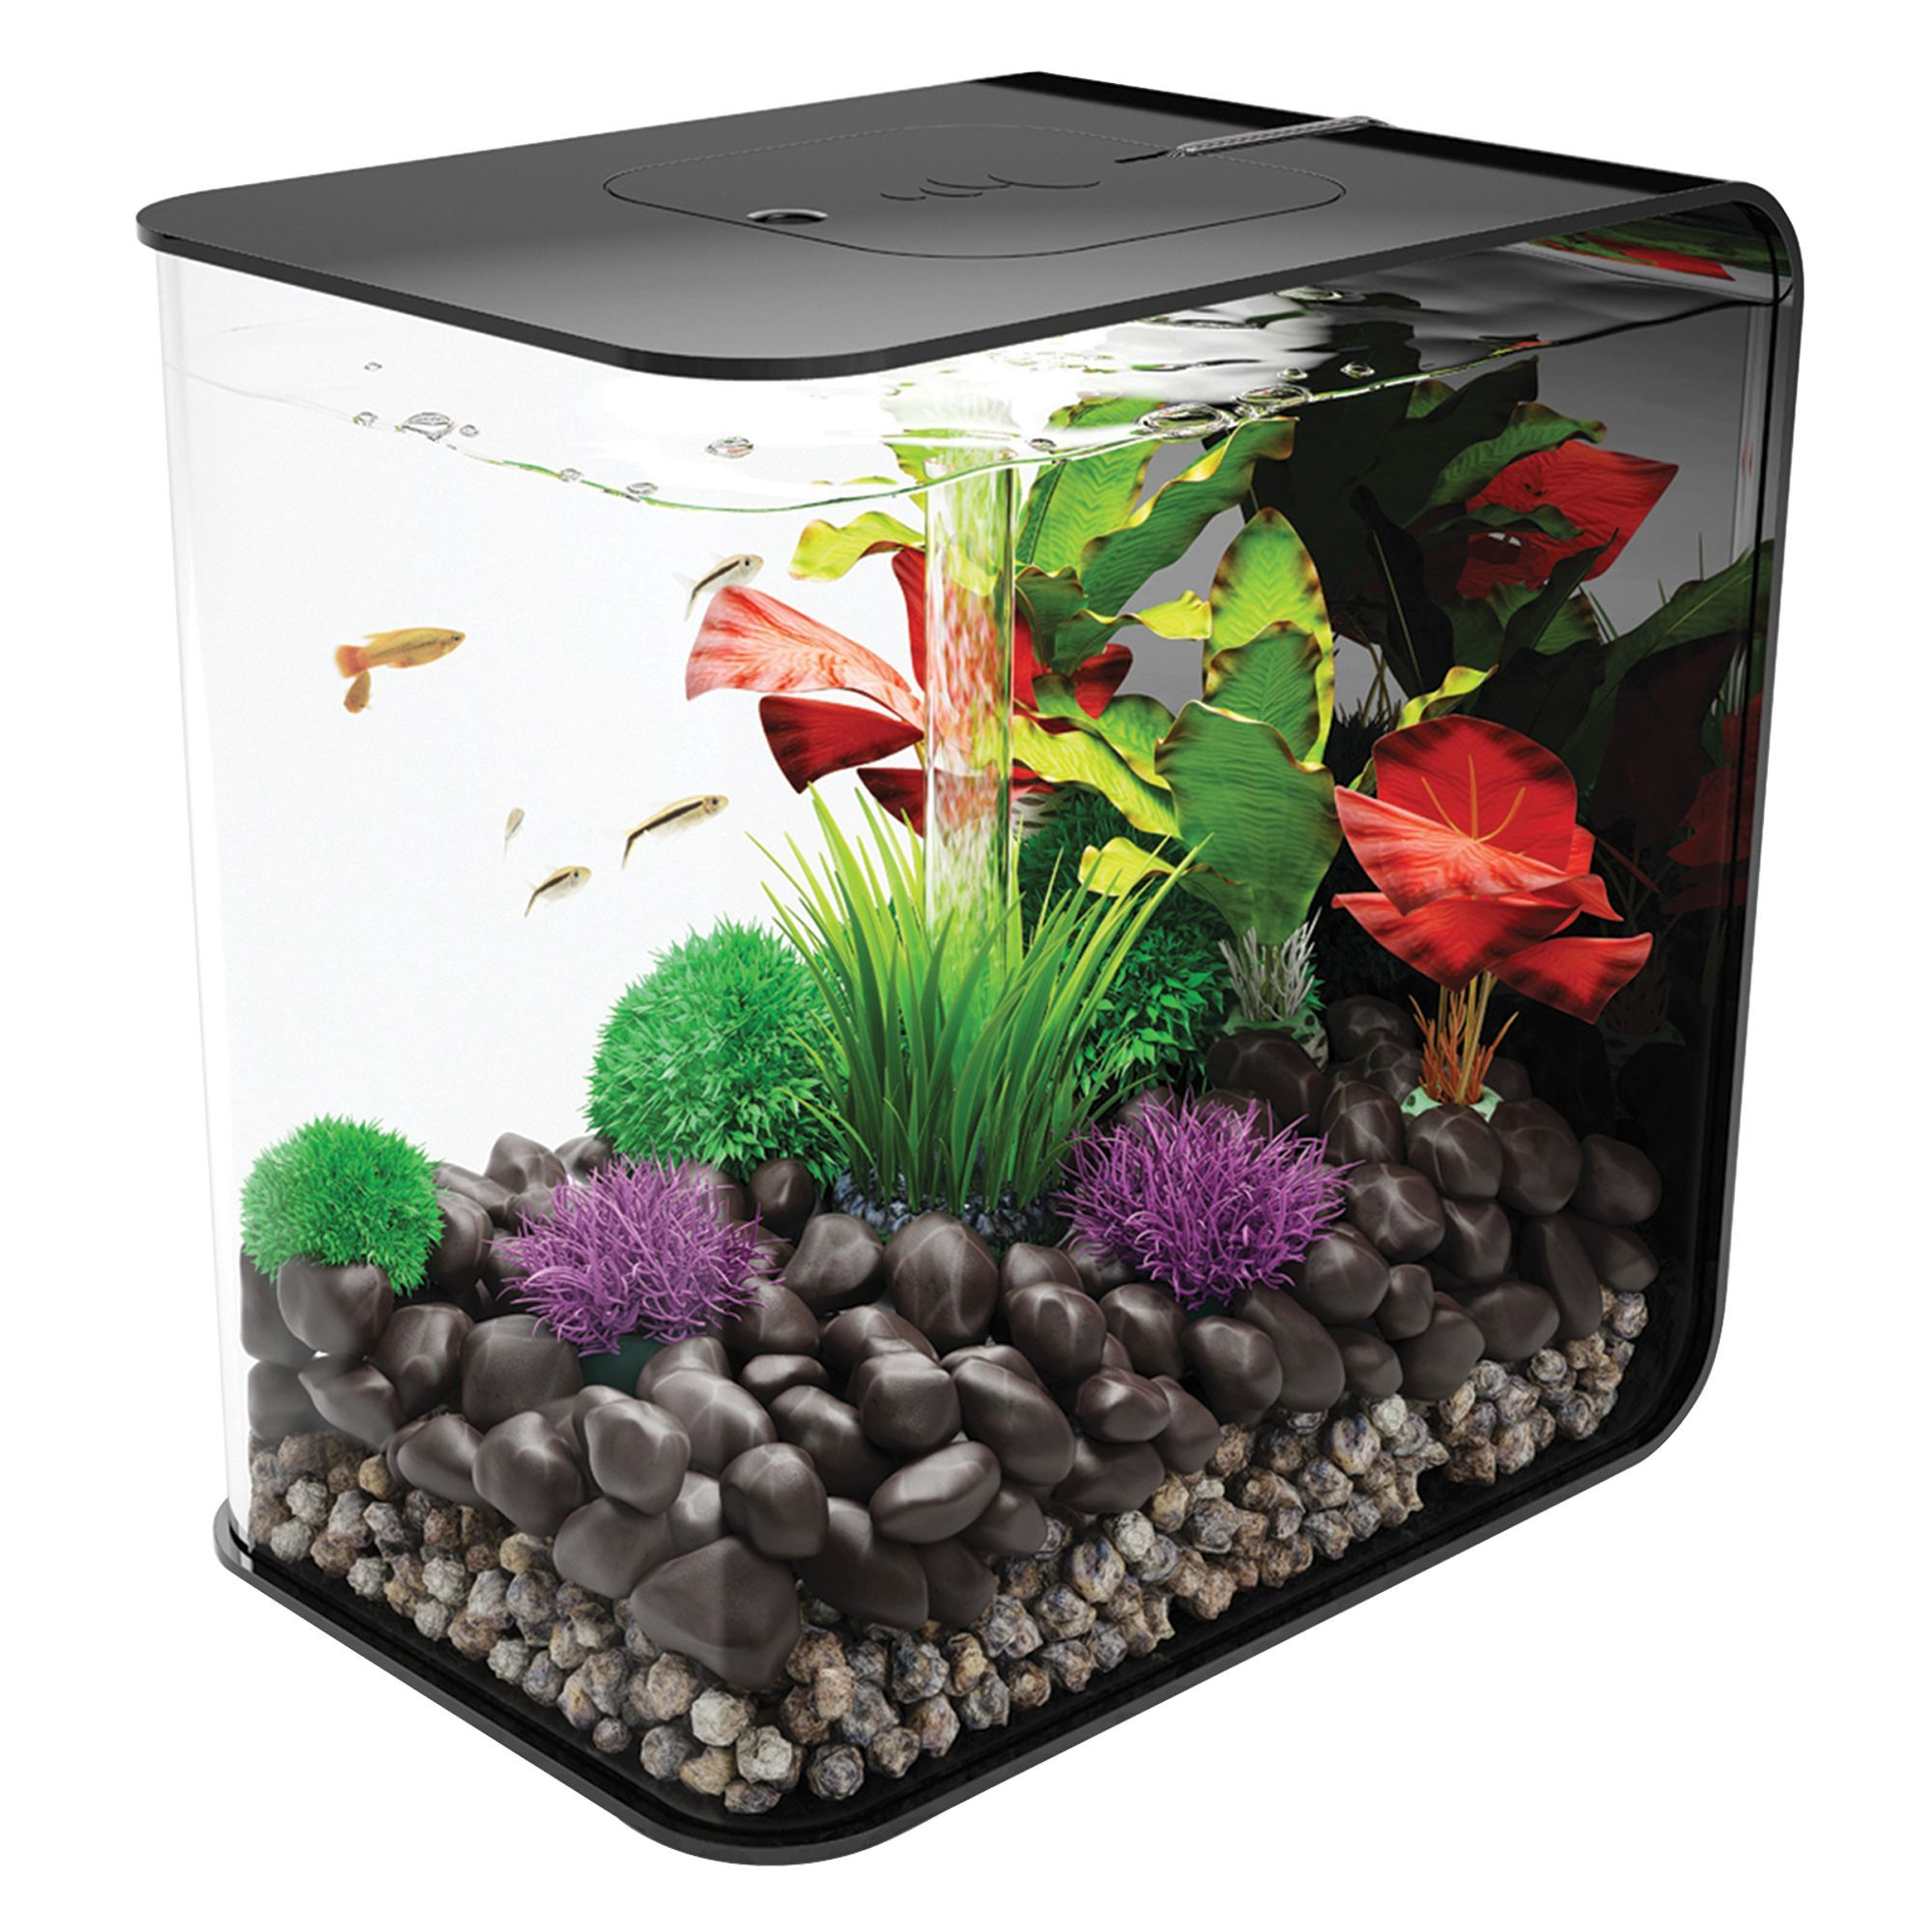 biOrb® FLOW 8 Gallon LED Aquarium Biorb fish tank